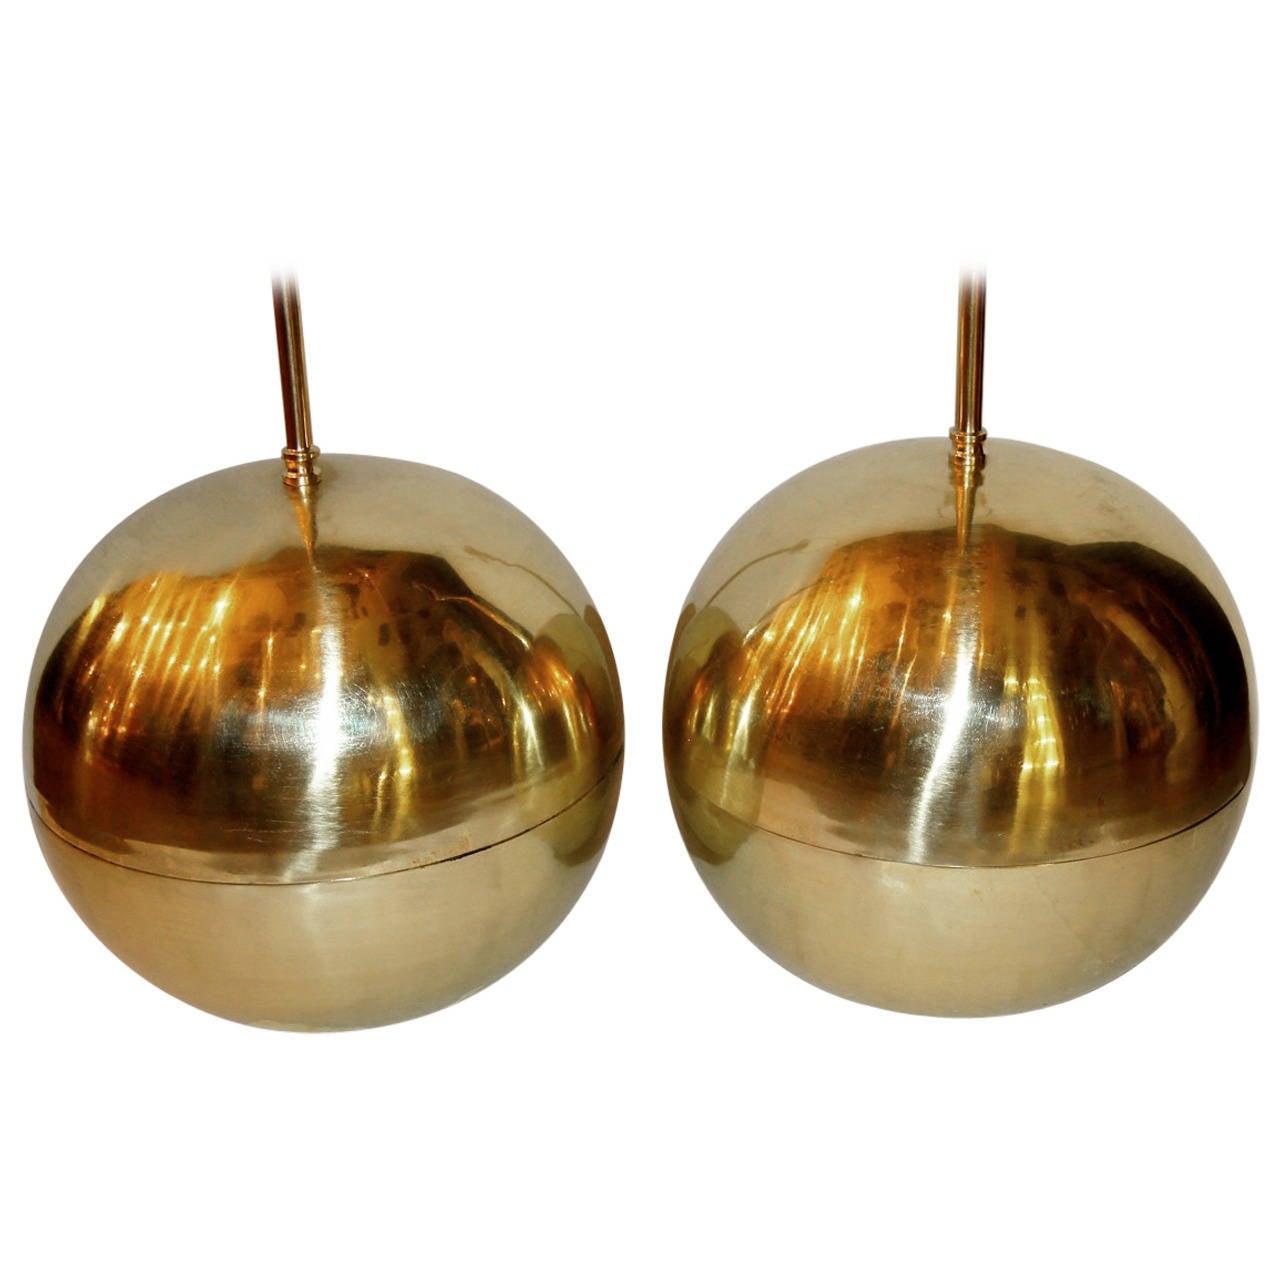 Pair of Large Midcentury Italian Brass Lamps